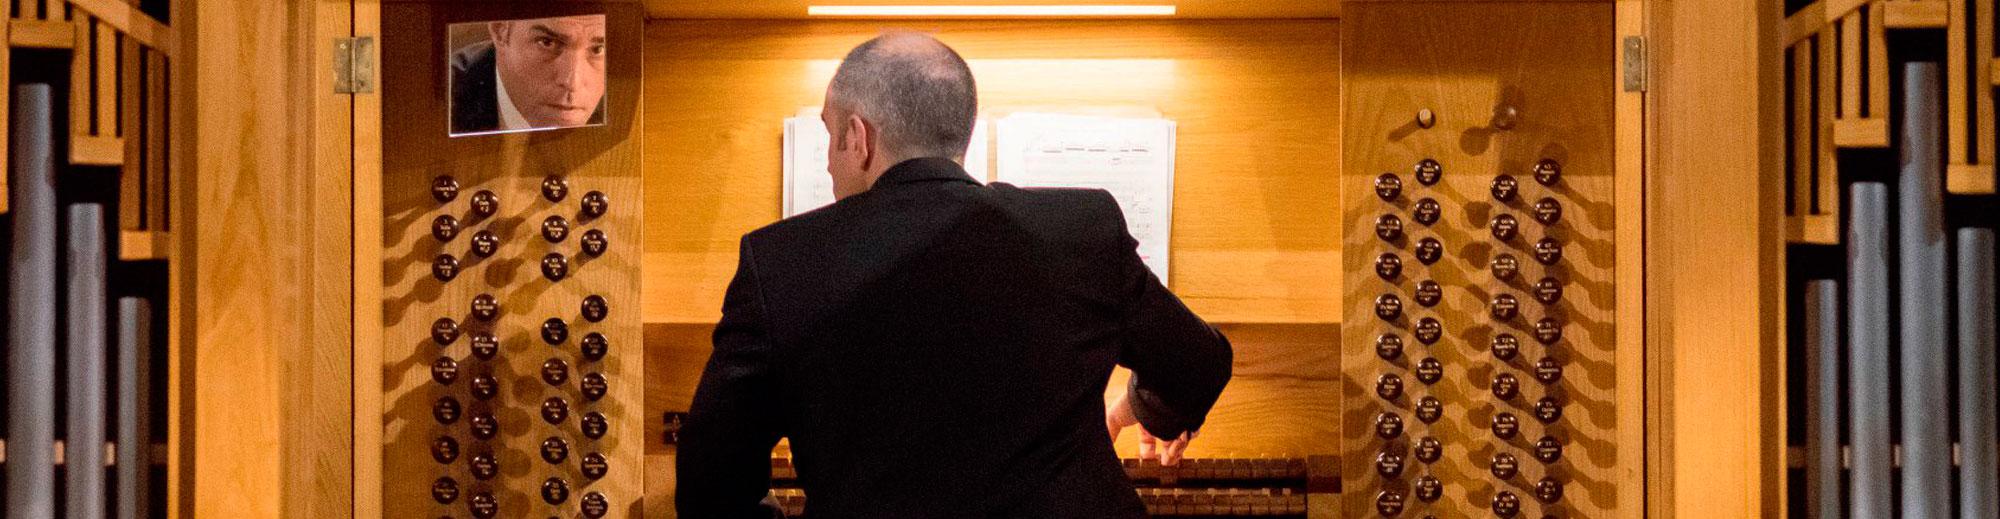 Juan de la Rubia debuta con la Orquesta Nacional de España